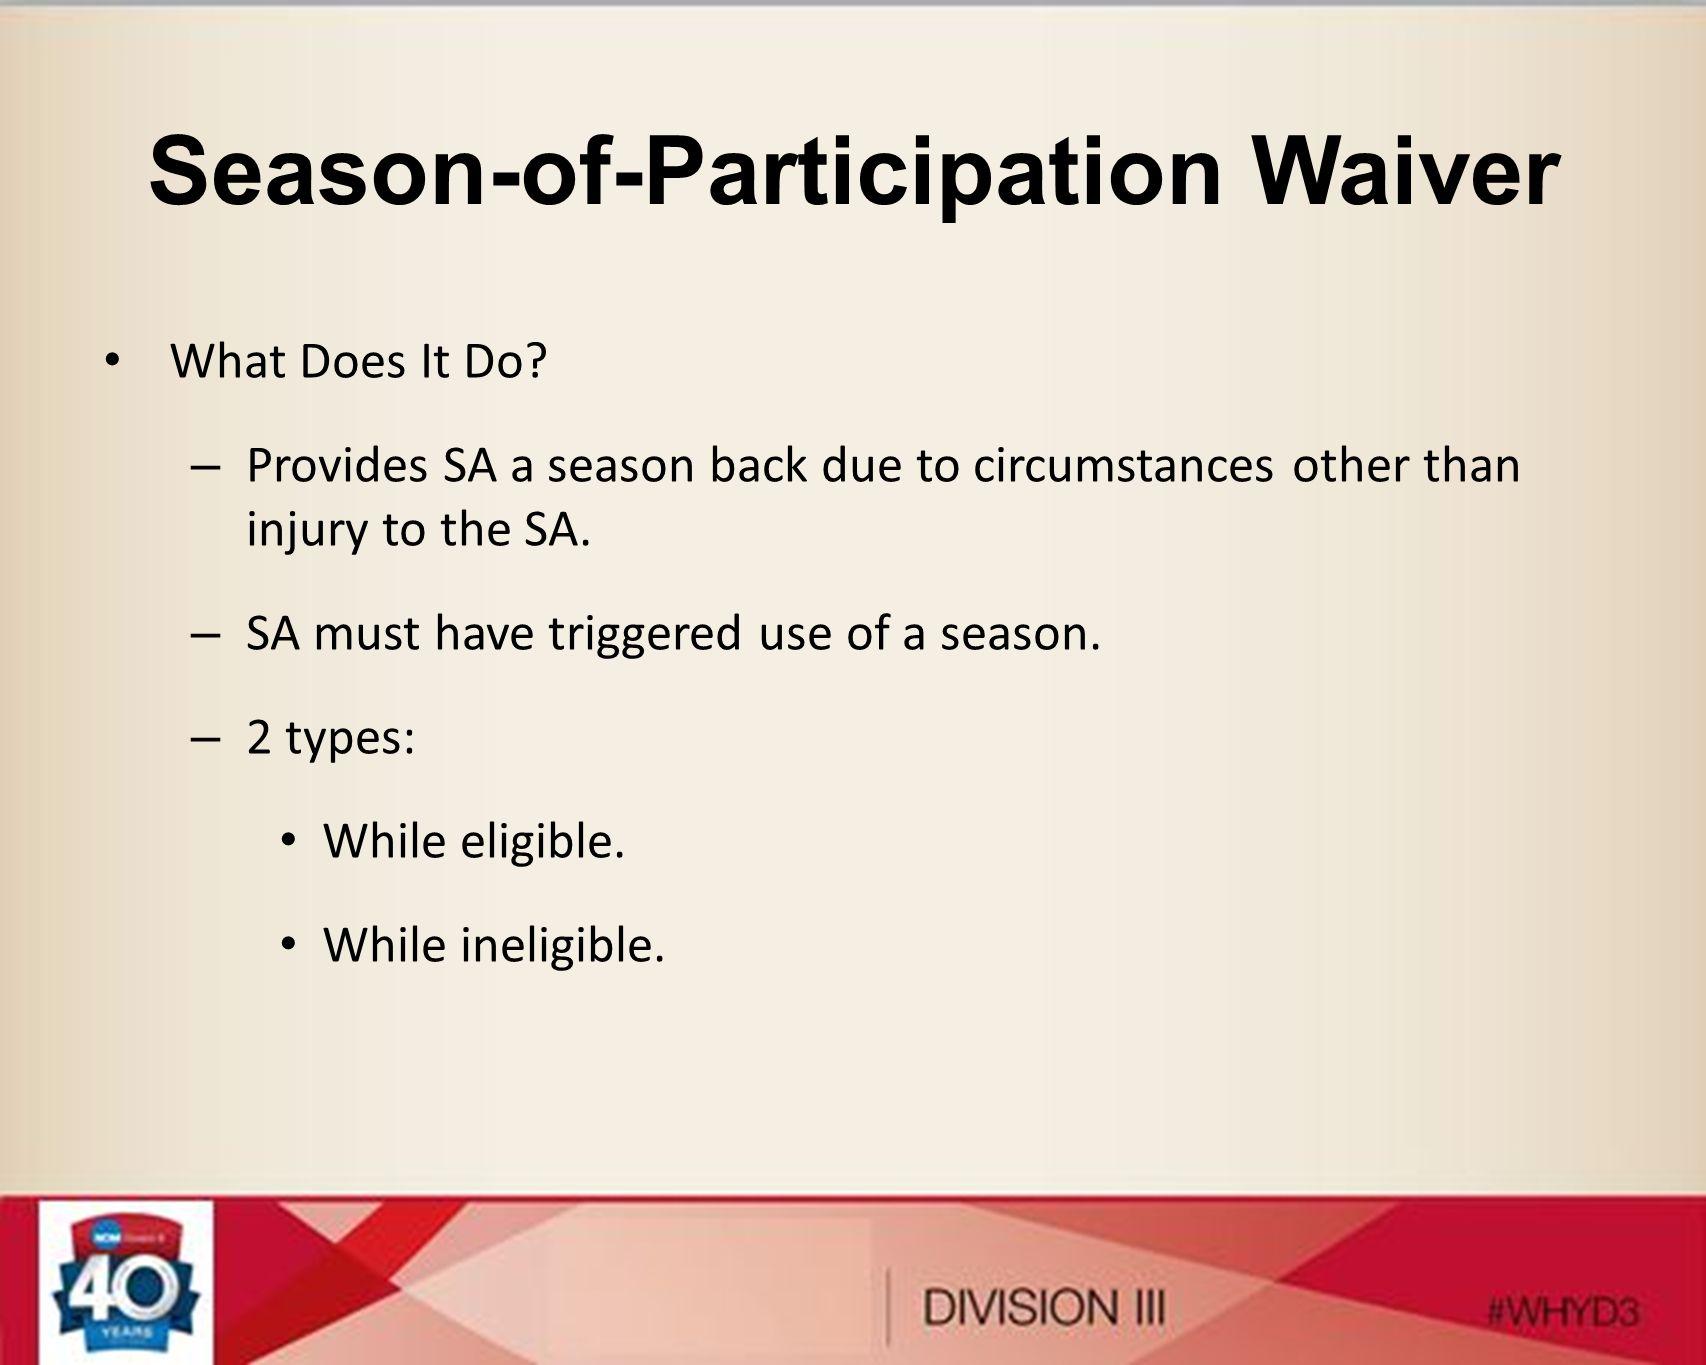 Season-of-Participation Waiver